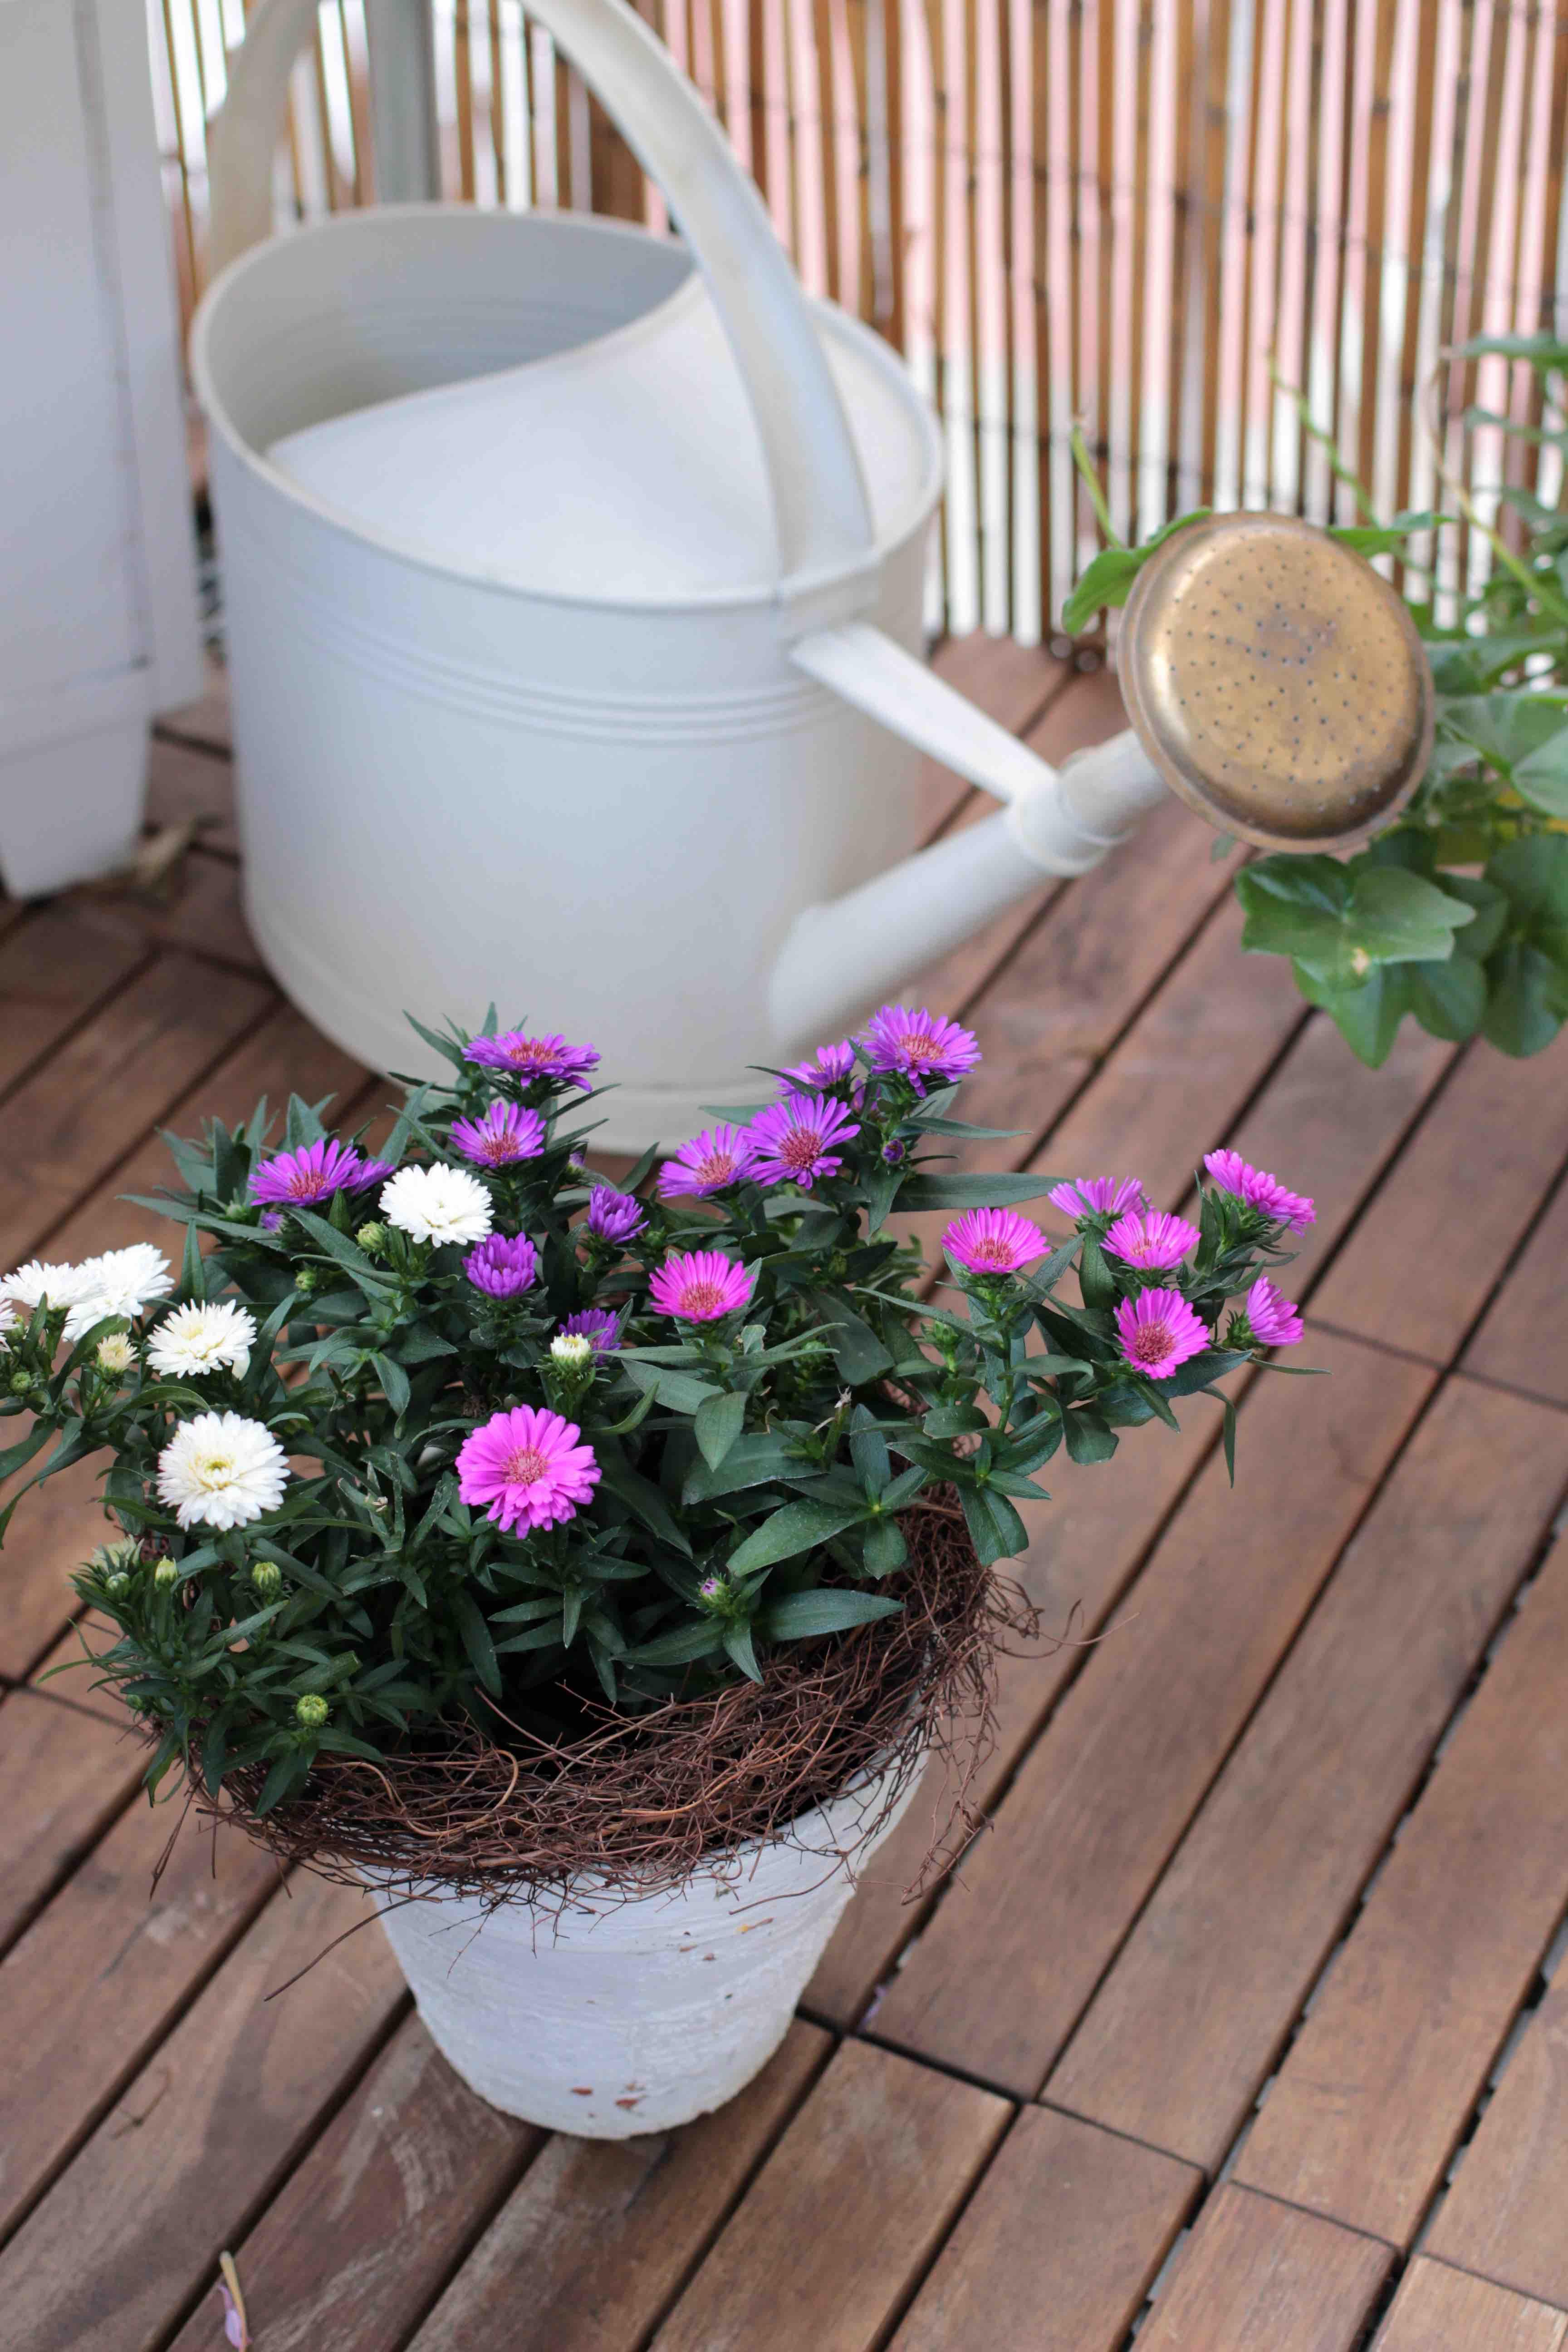 herbst balkonbepflanzung